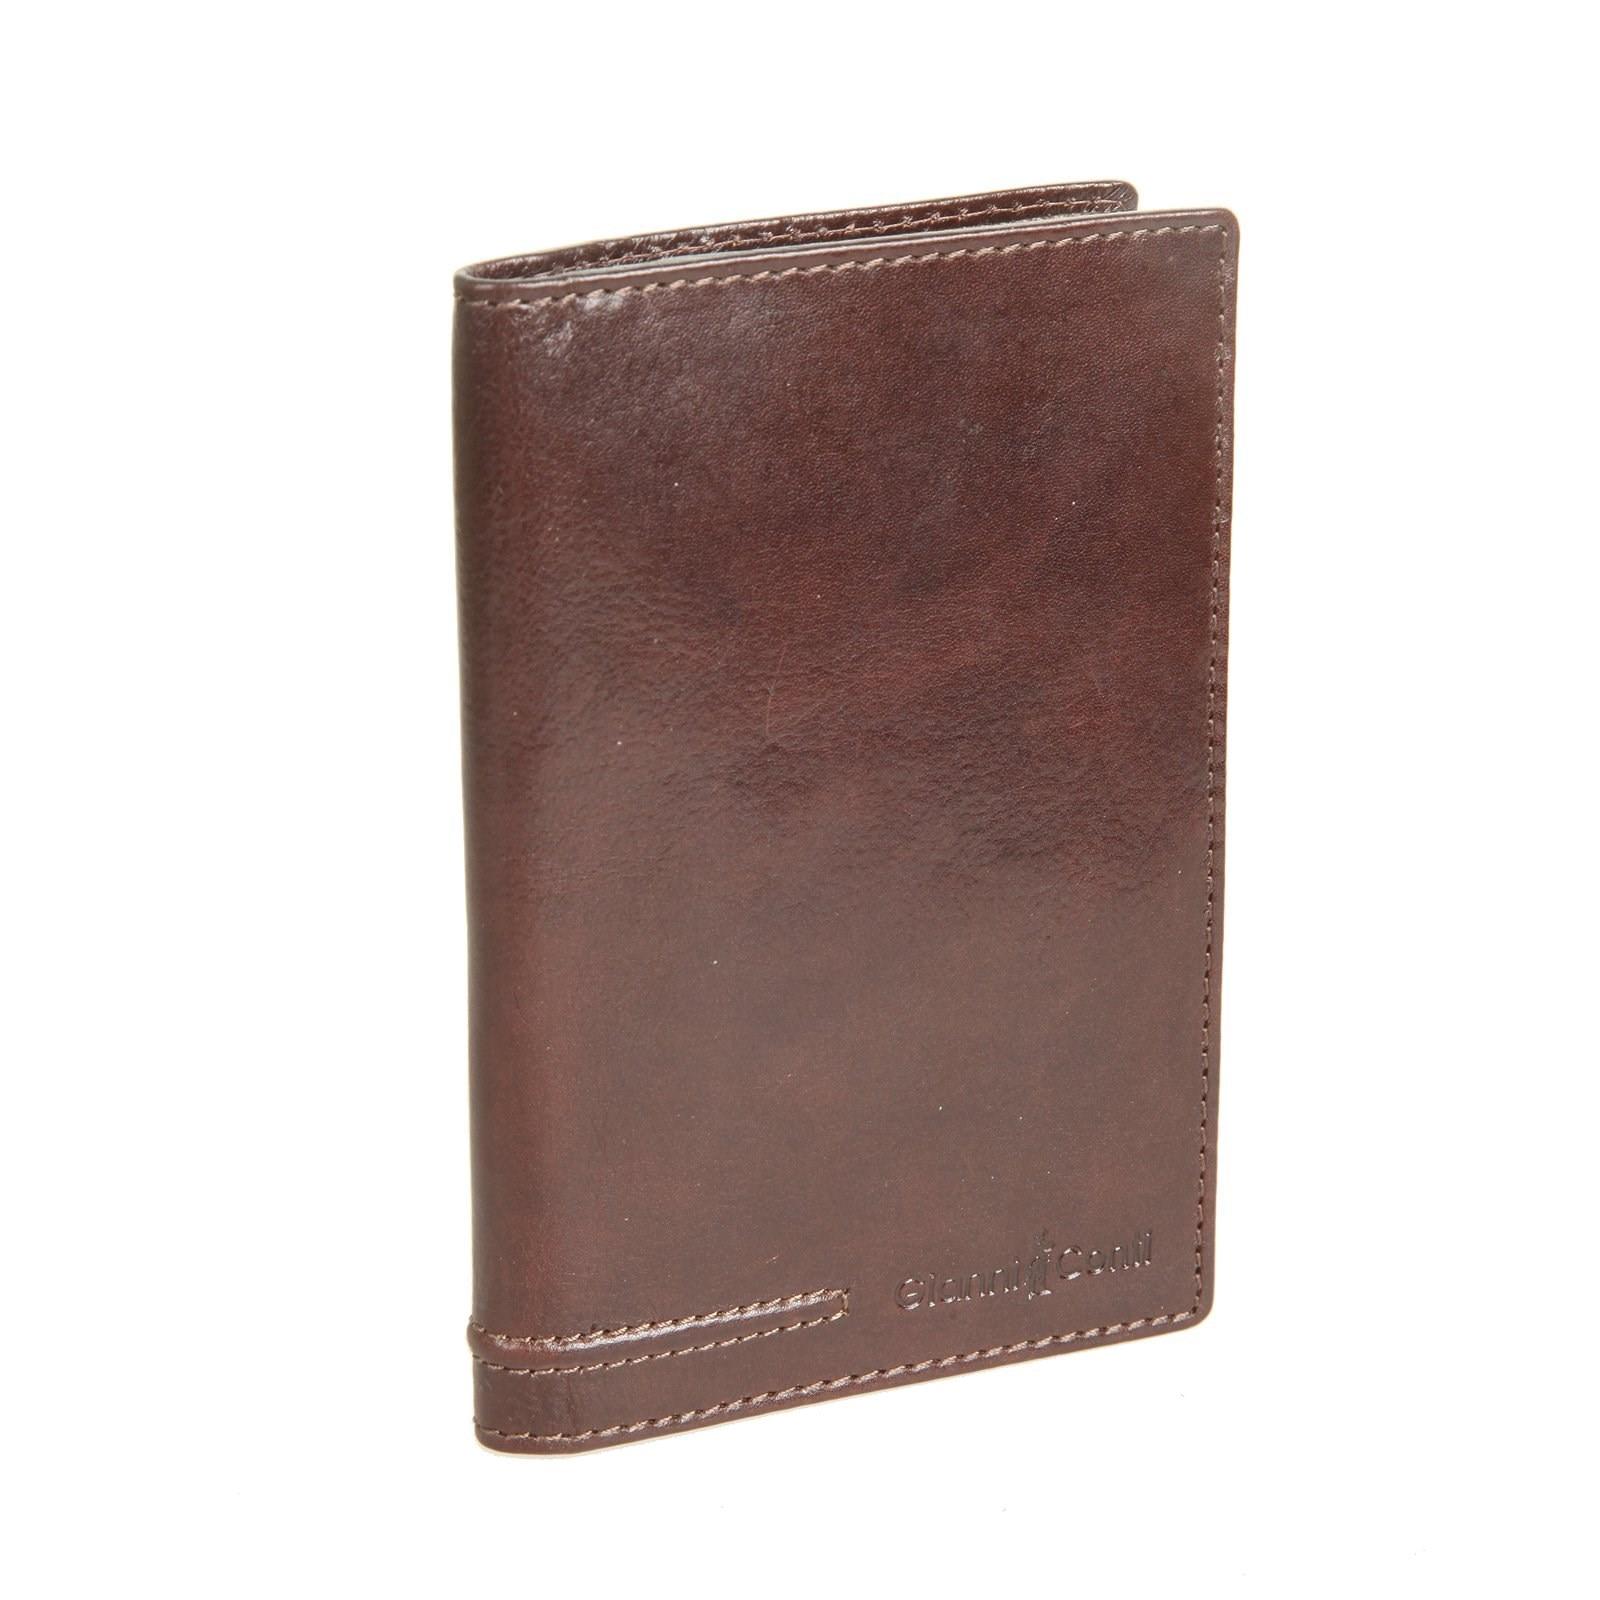 Passport cover Gianni Conti 707455 Brown foreverfriendsfashion pu lear passport holder world map travel passport cover case brand passport holder documents folder bag